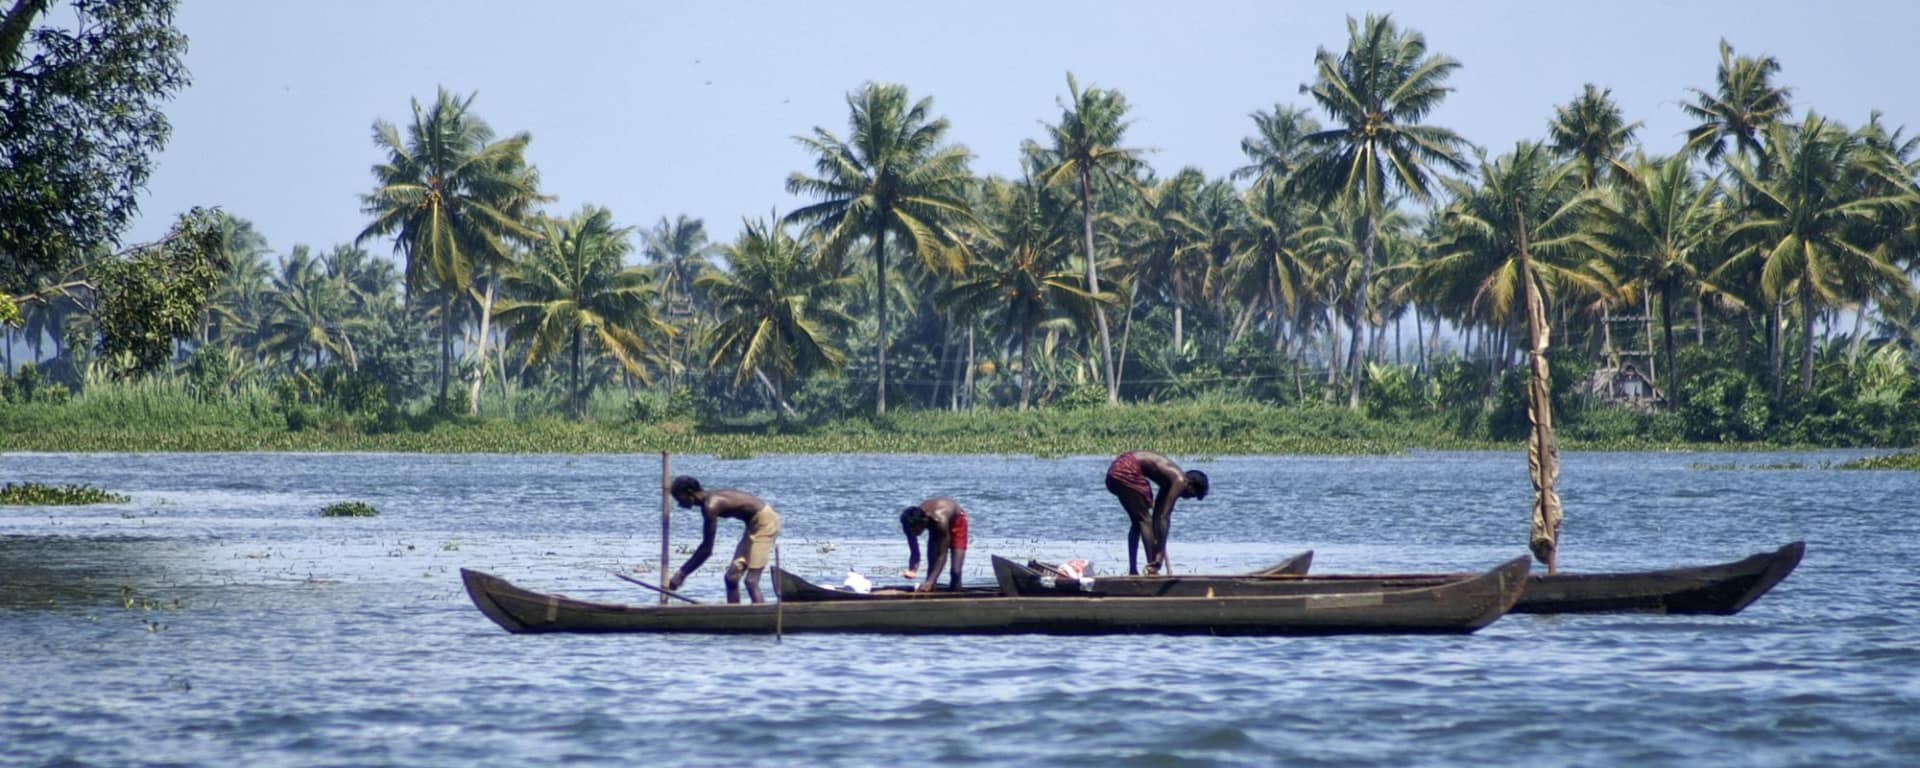 Backwaters von Kerala ab Kochi: Backwaters: Boatmen